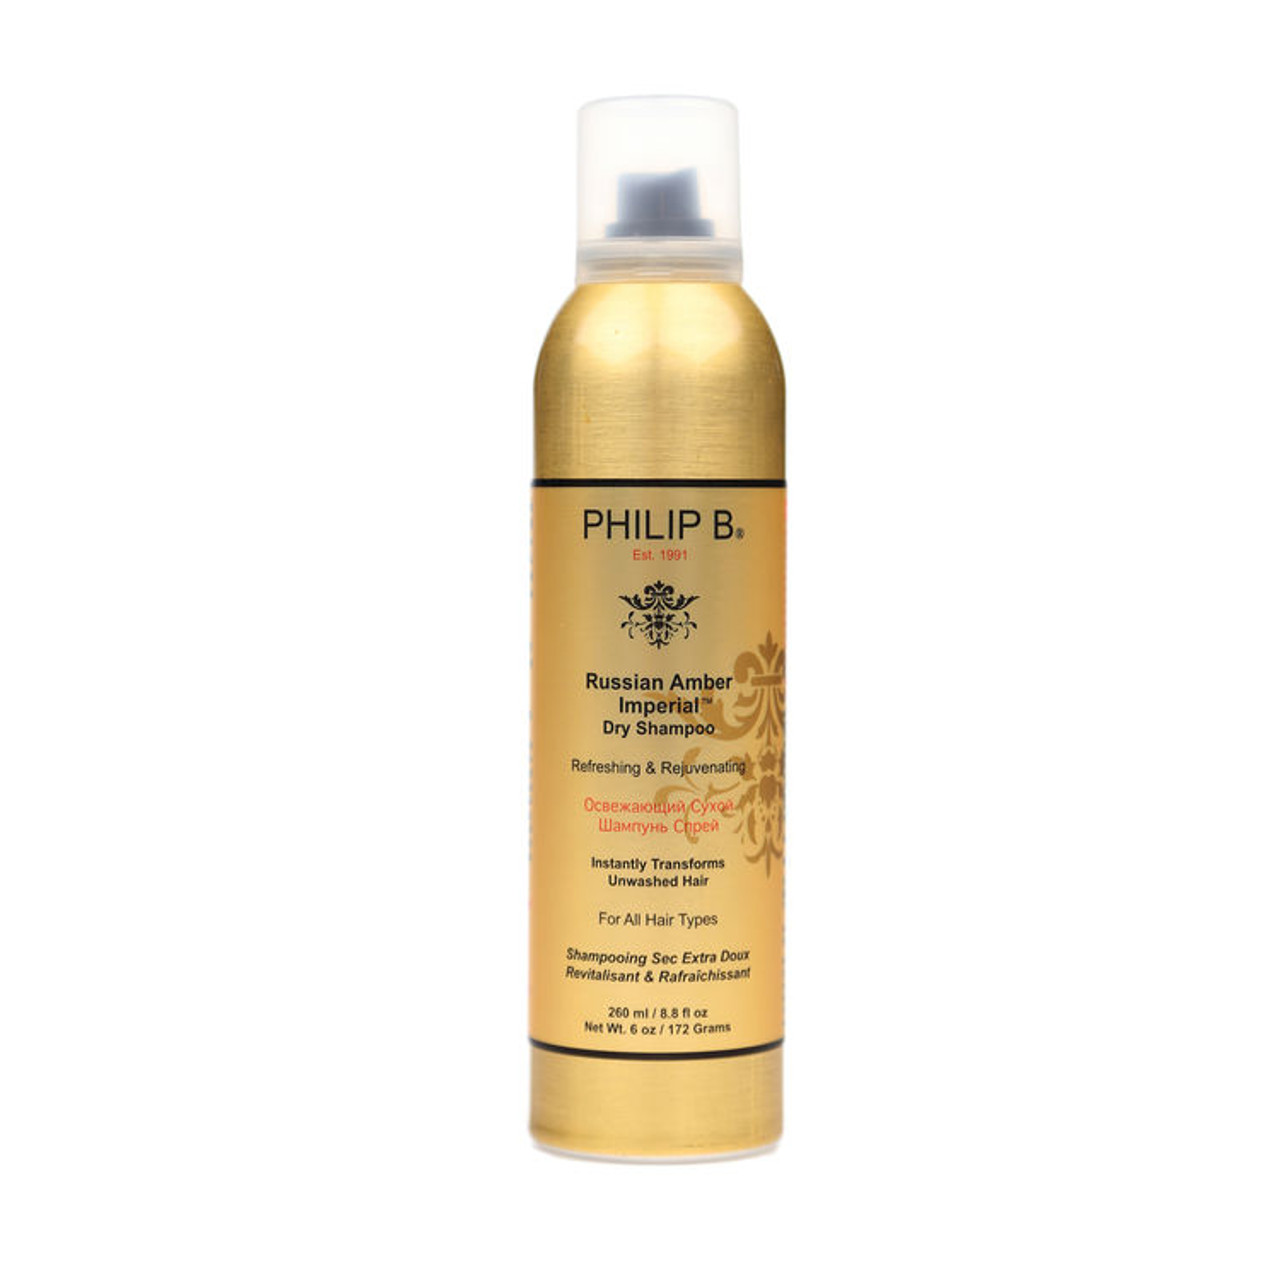 Philip B Russian Amber Imperial Dry Shampoo 8.8 oz